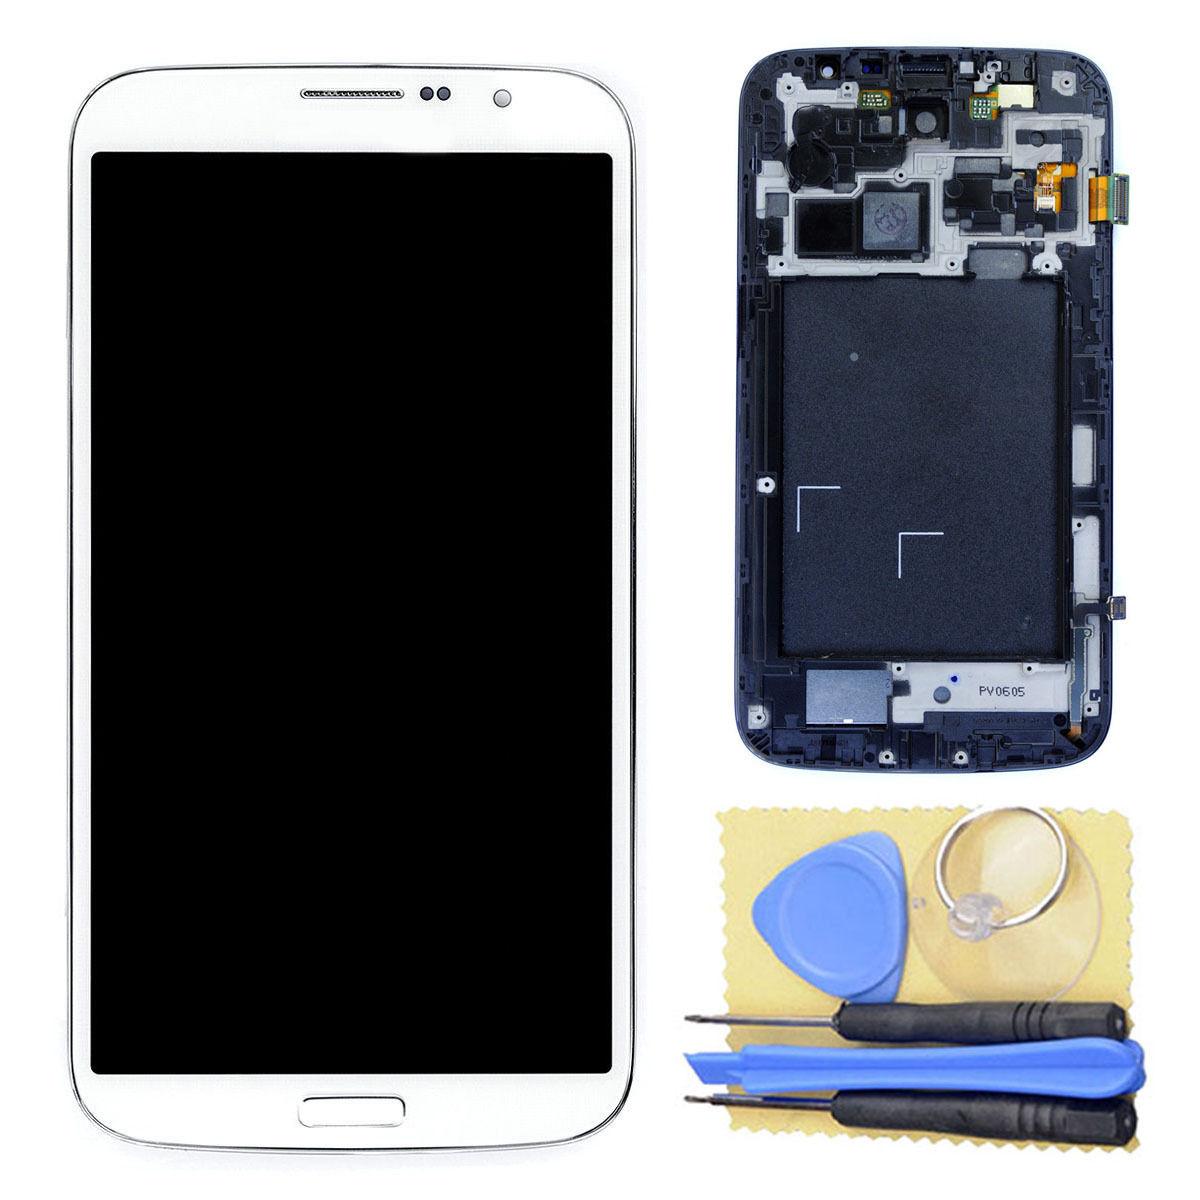 Tela Display Lcd Touch Screen Samsung Galaxy Mega 6.3 Origin